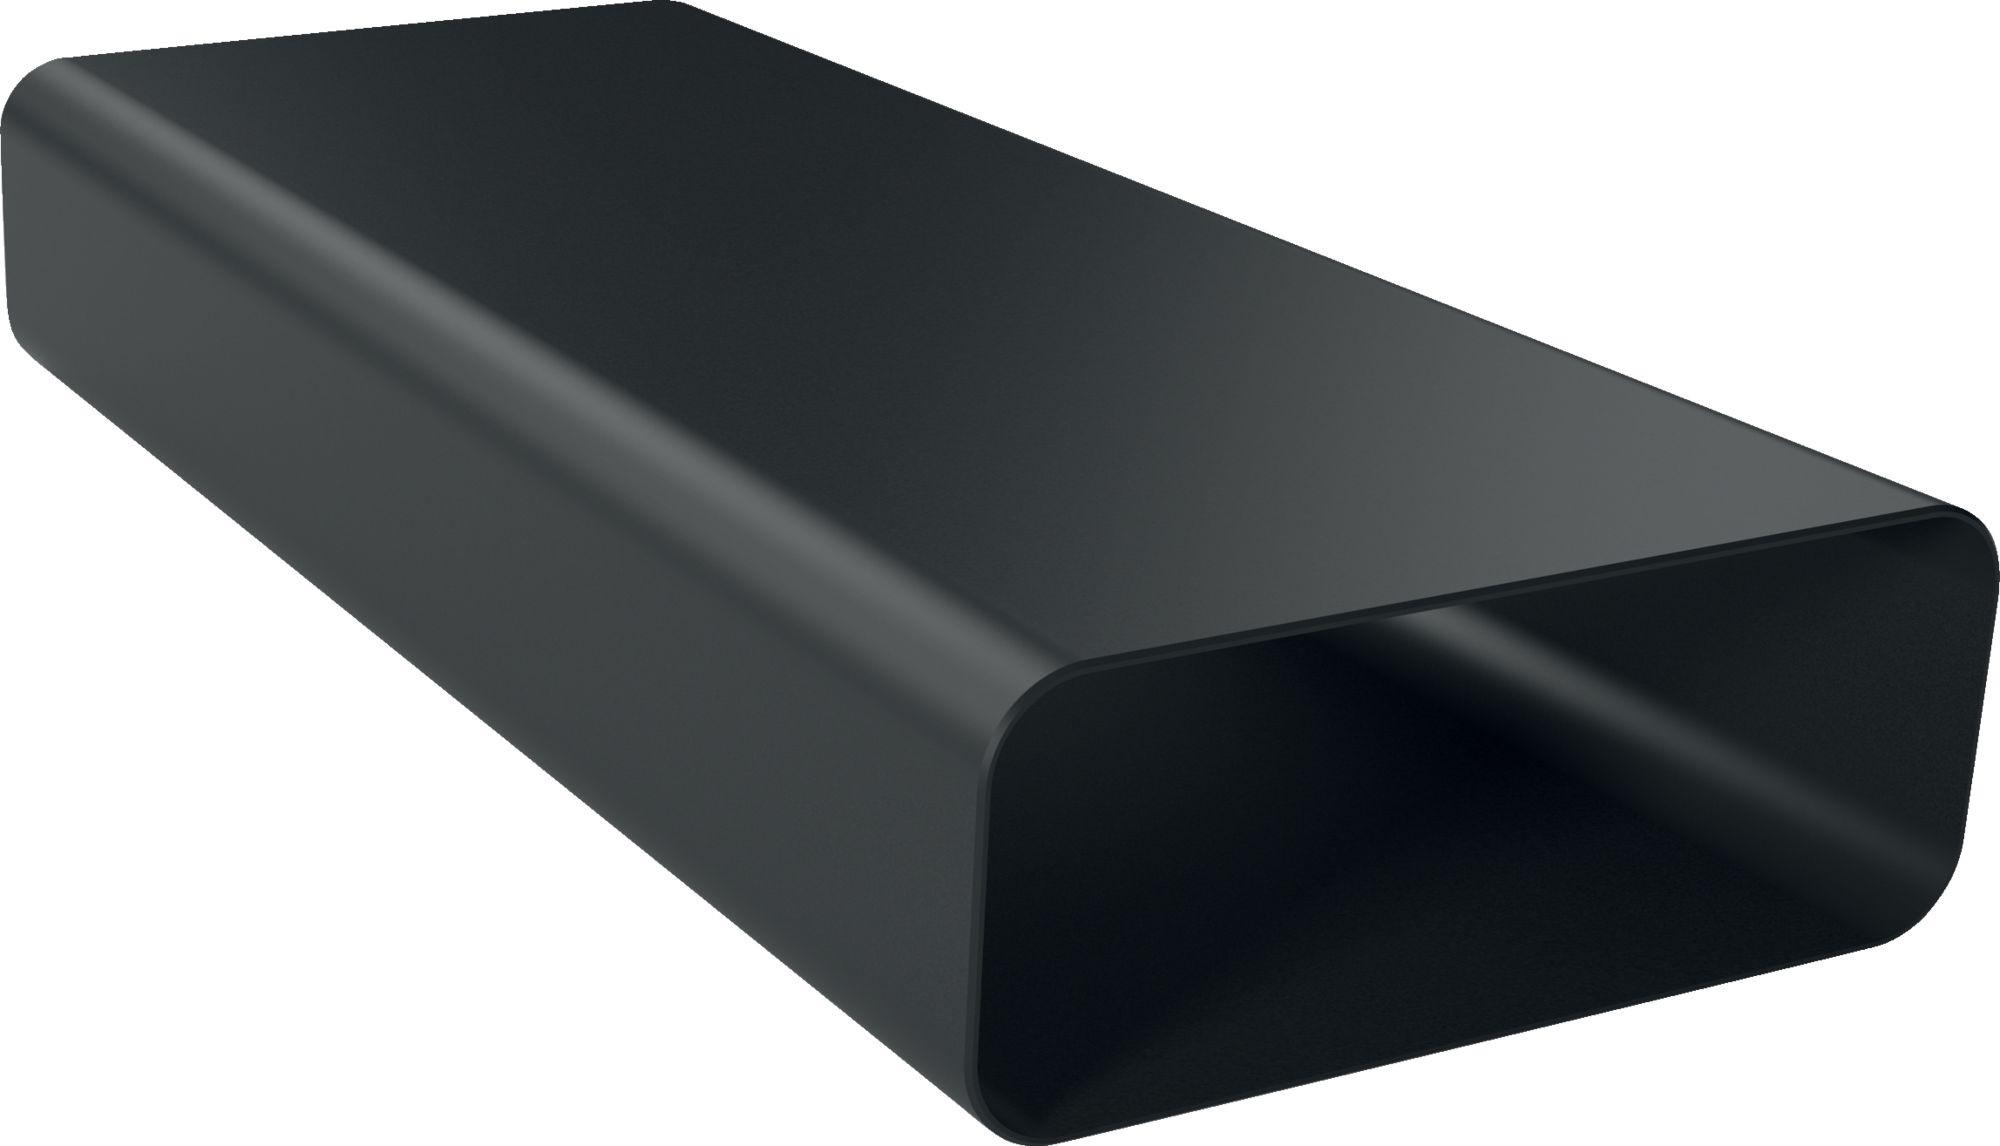 Bosch HEZ9VDSM2 1000mm long duct - 222mm x 89mm